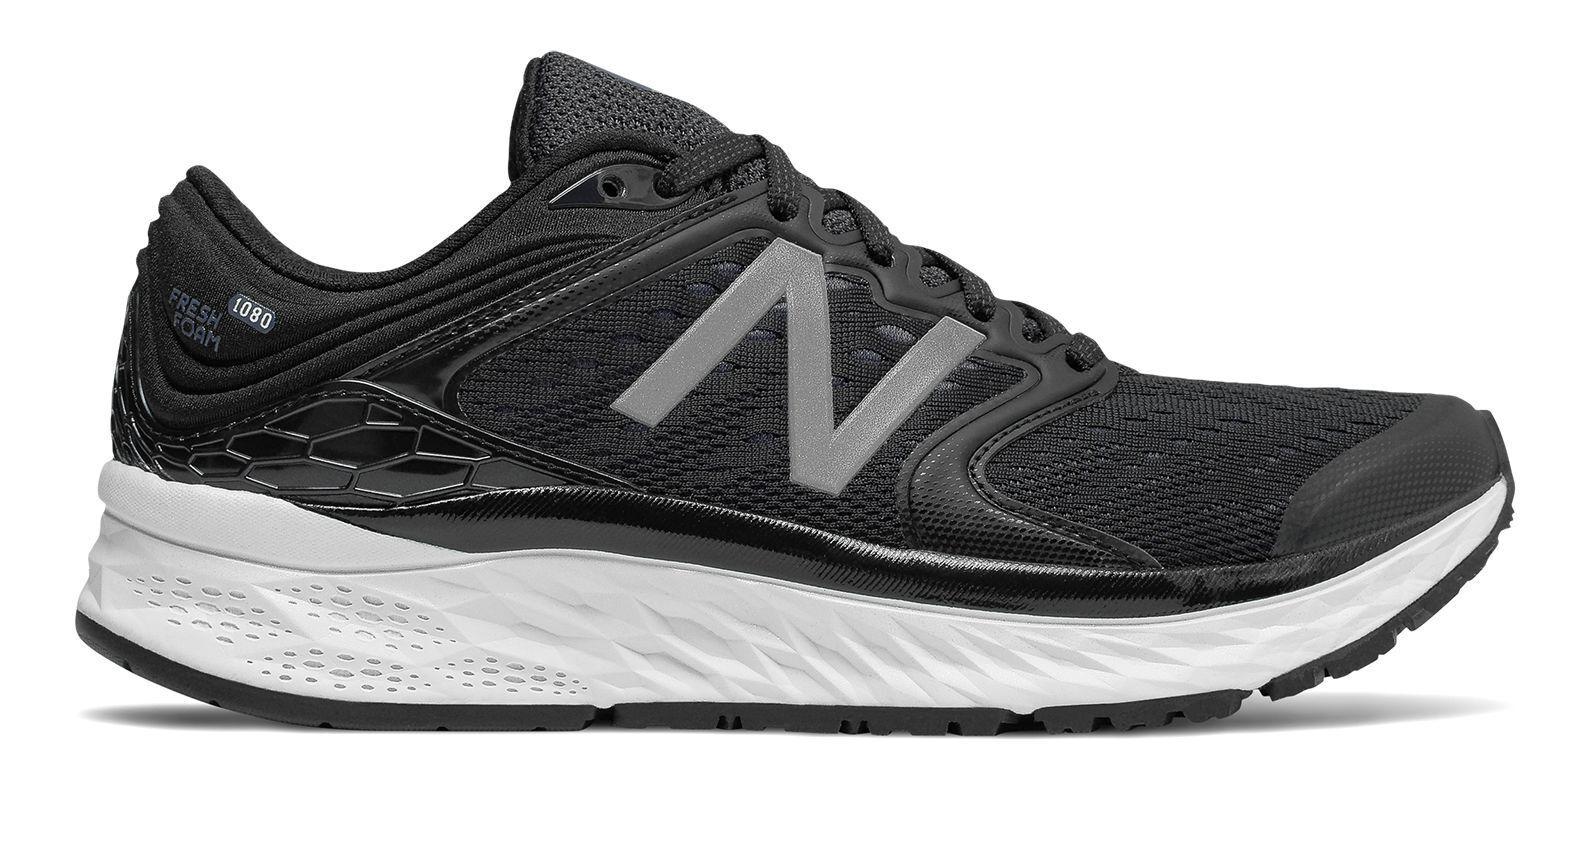 New Balance Women's Fresh Foam Midsole 1080V8 Running shoes Black With White